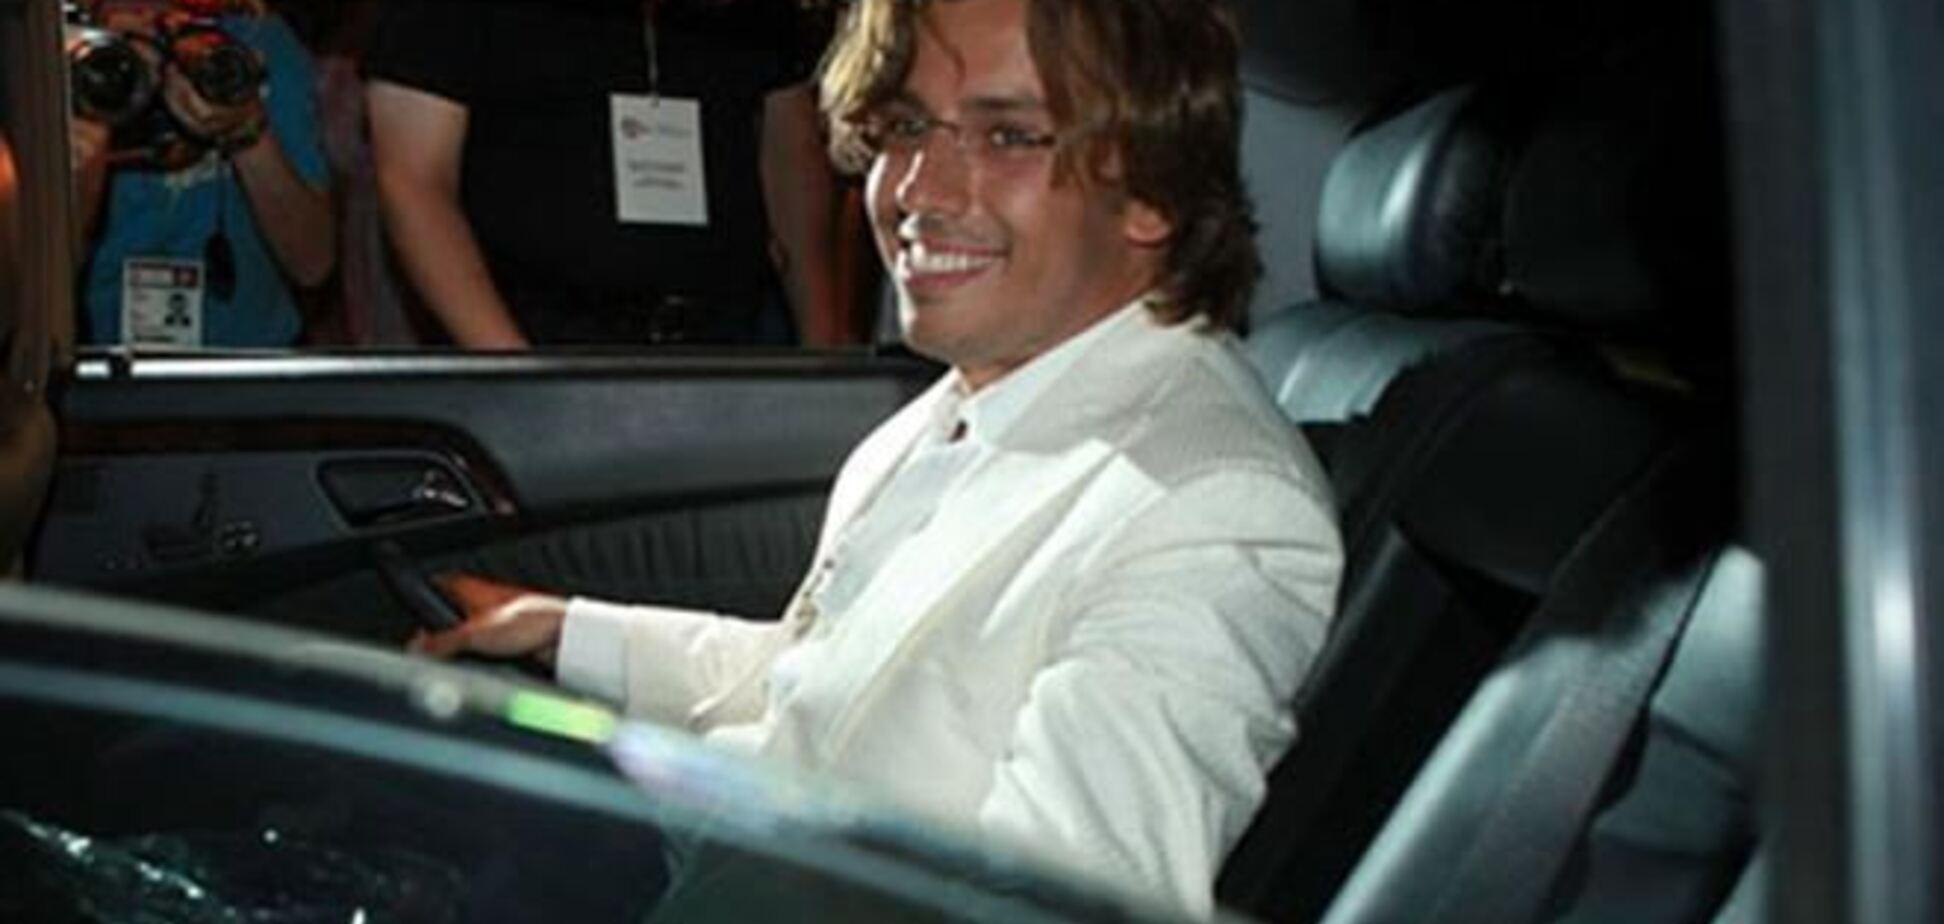 У Bentley Галкіна врізався мікроавтобус